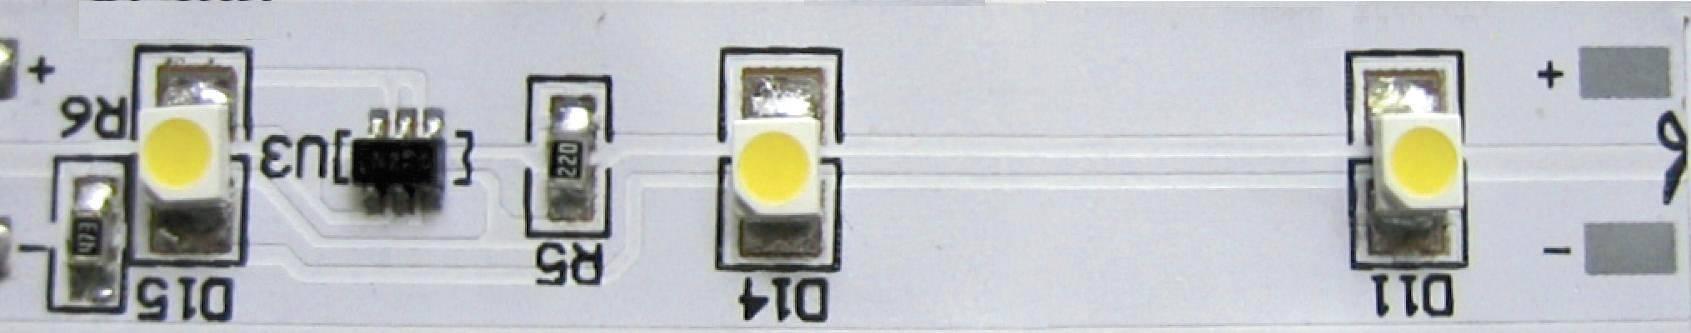 LED pás ohebný samolepicí 12VDC ledxon LED STRIPE 12VDC GELB, 9009043, 50 mm, žlutá